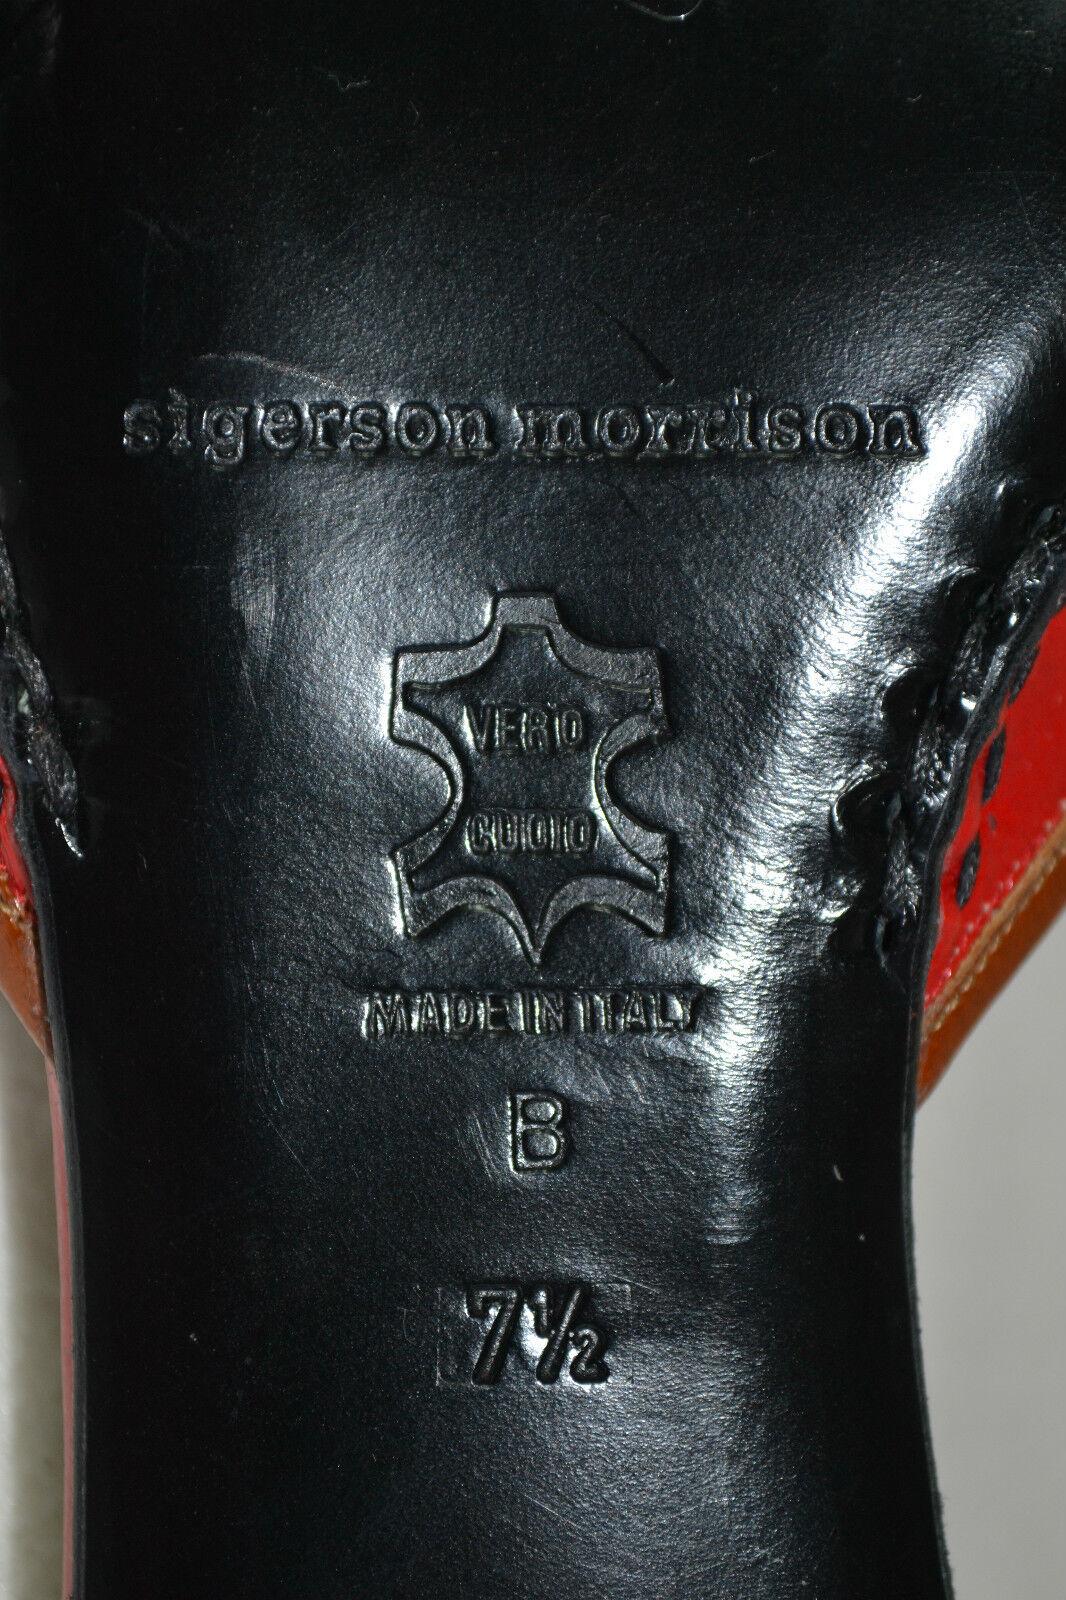 SIGERSON LEDER MORRISON SHOES Schuhe MULES LEDER SIGERSON 37,5 UK 4,5 USA 6,5 NEU  NEW edel d959cb